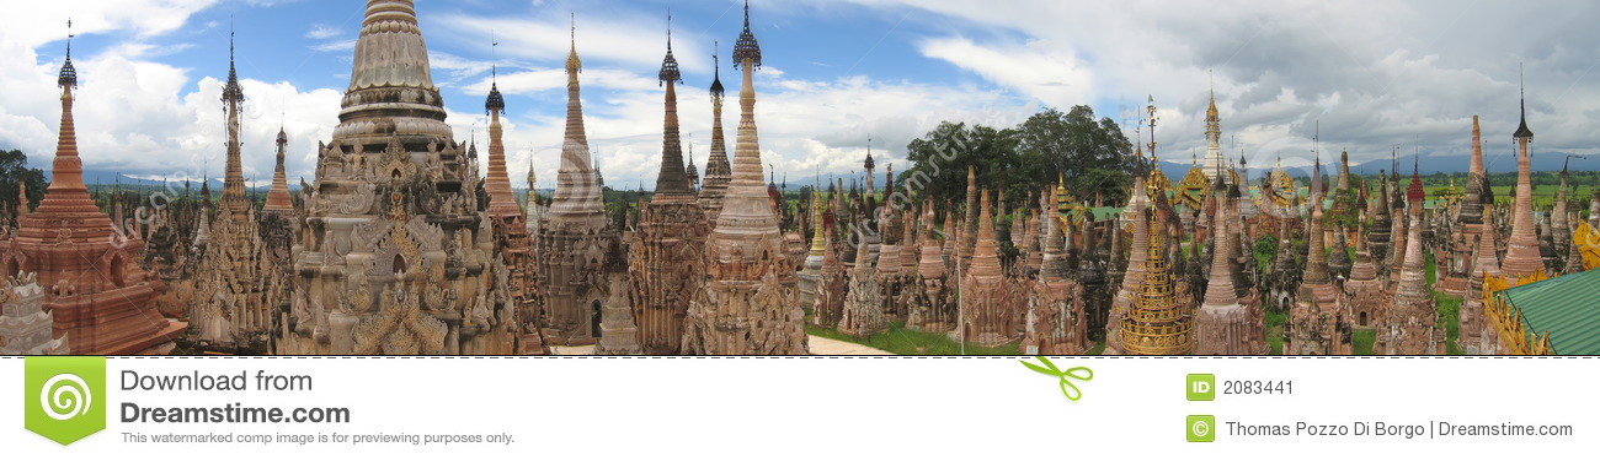 Sacred buddhist site